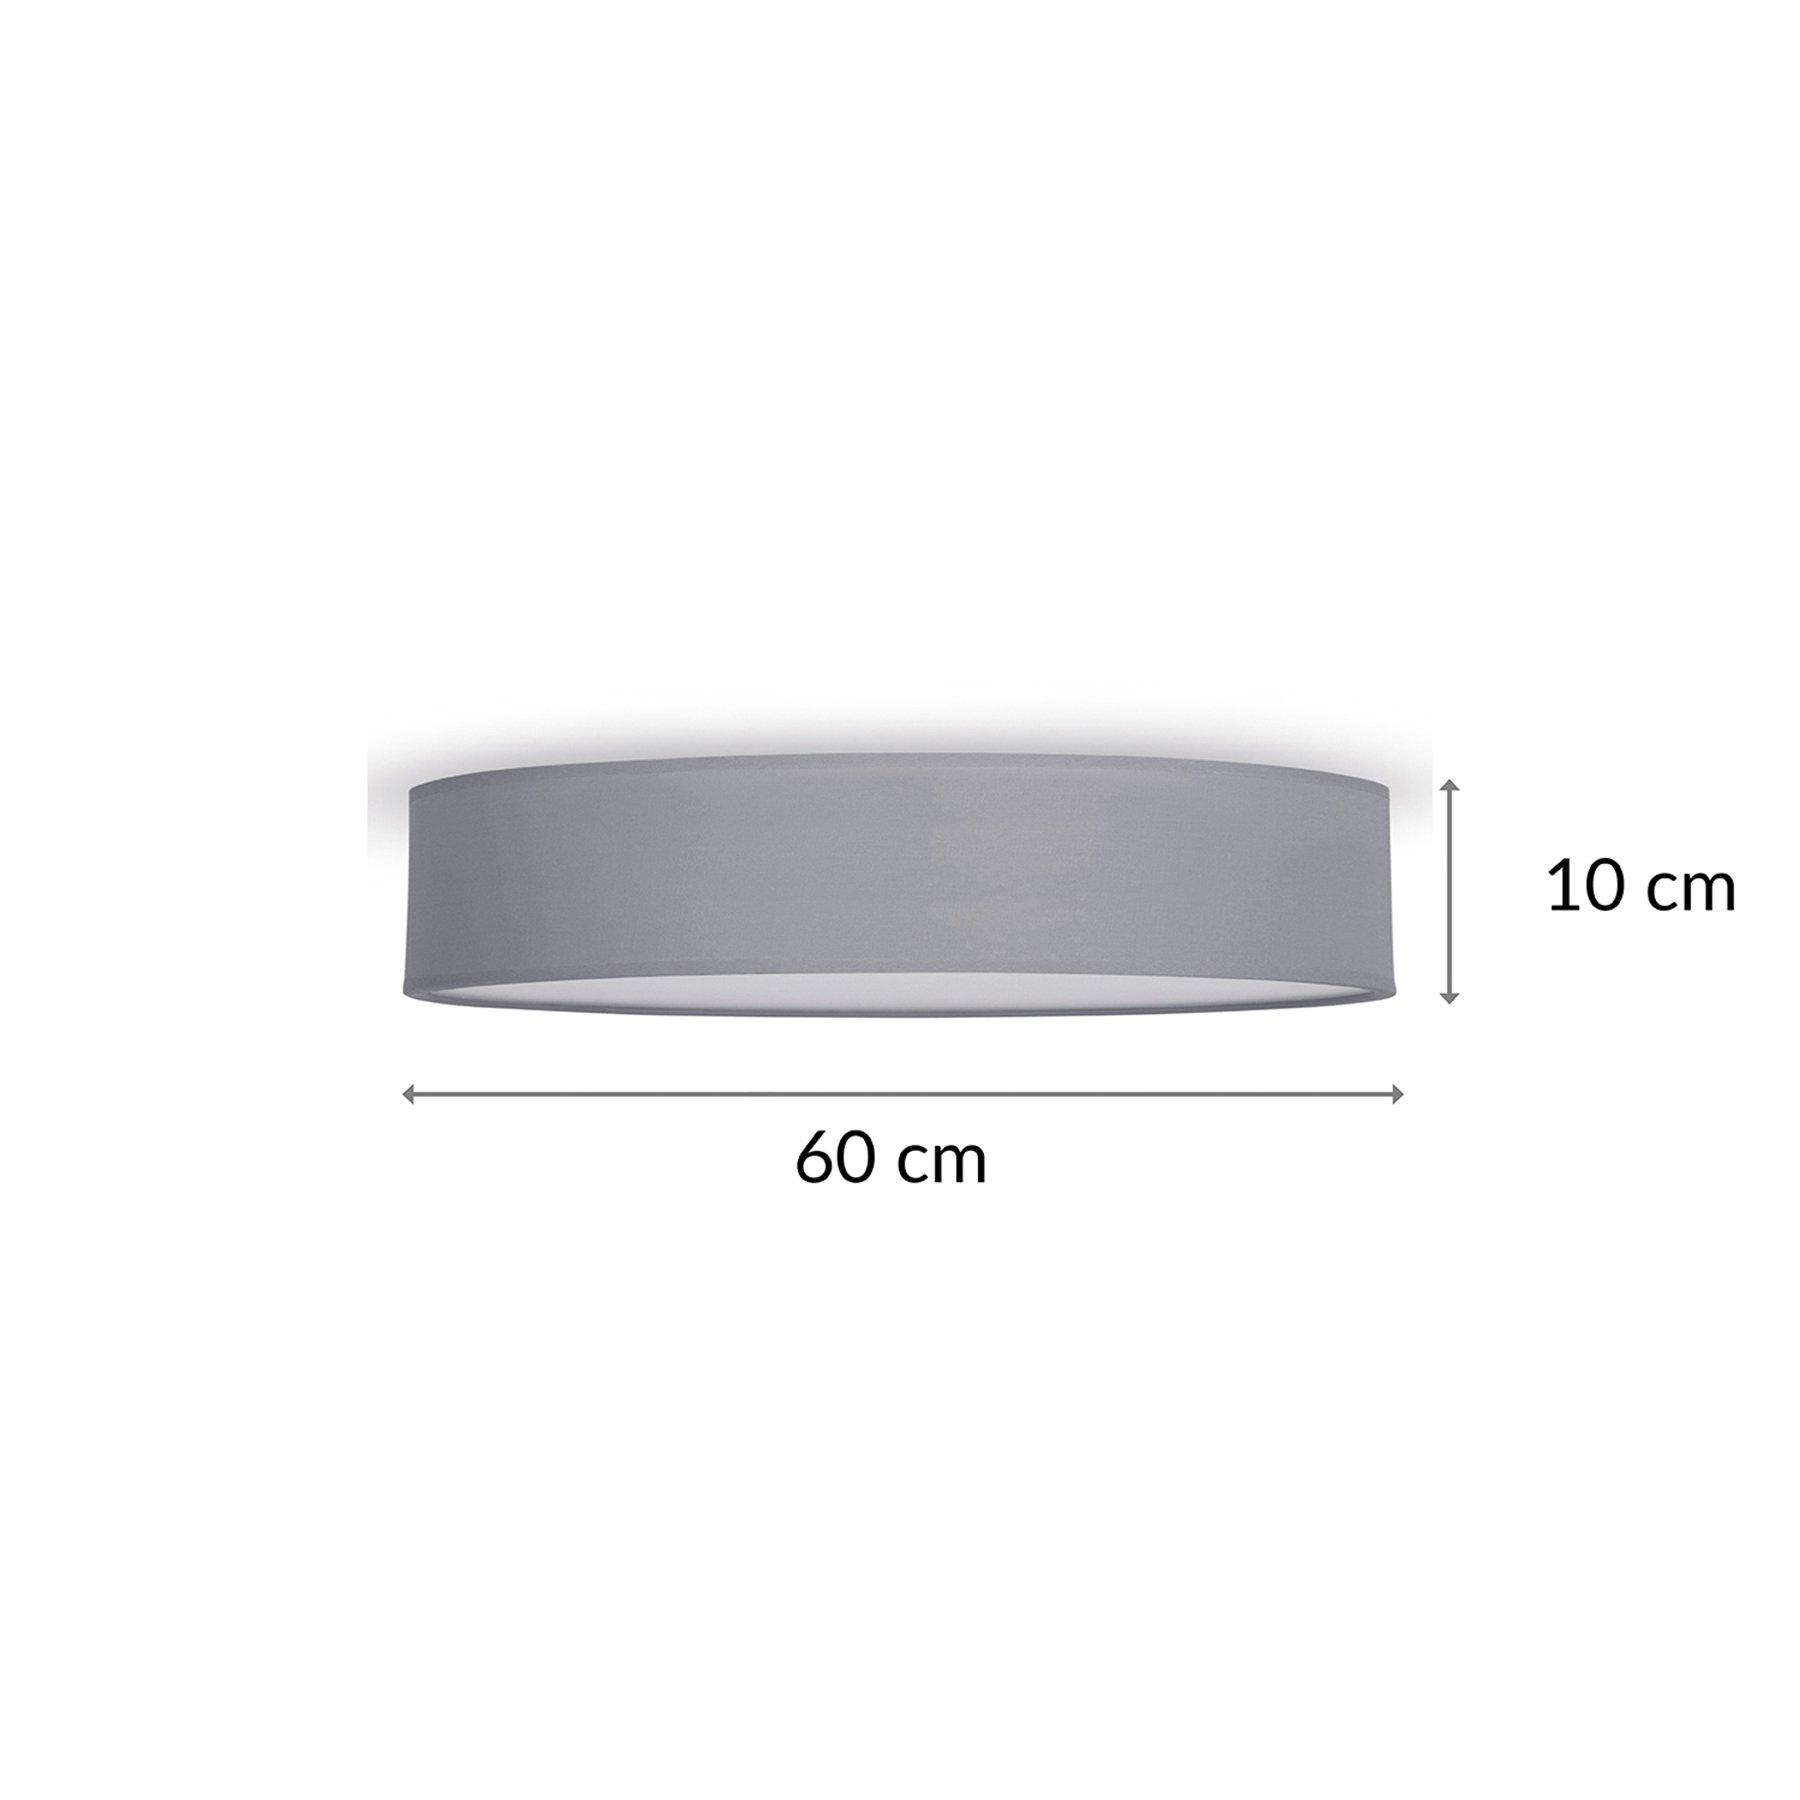 Taklampe Mia, grå, Ø 60 cm